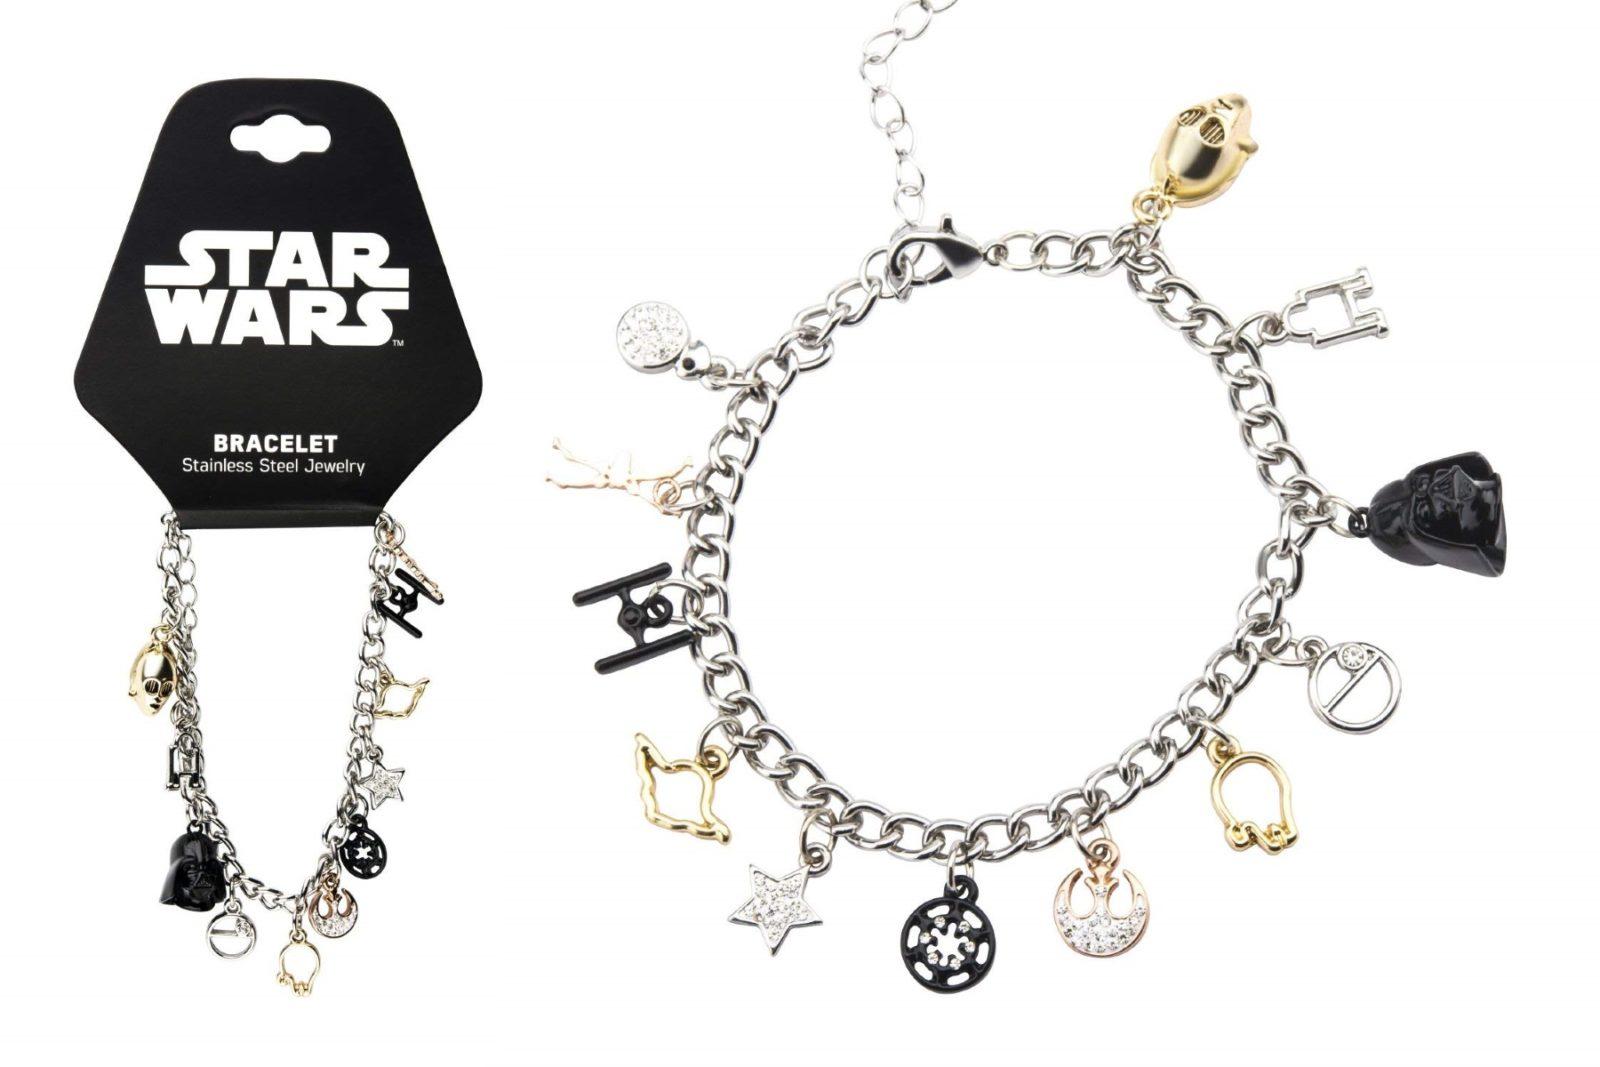 Star Wars Multi Charm Bracelet on Amazon